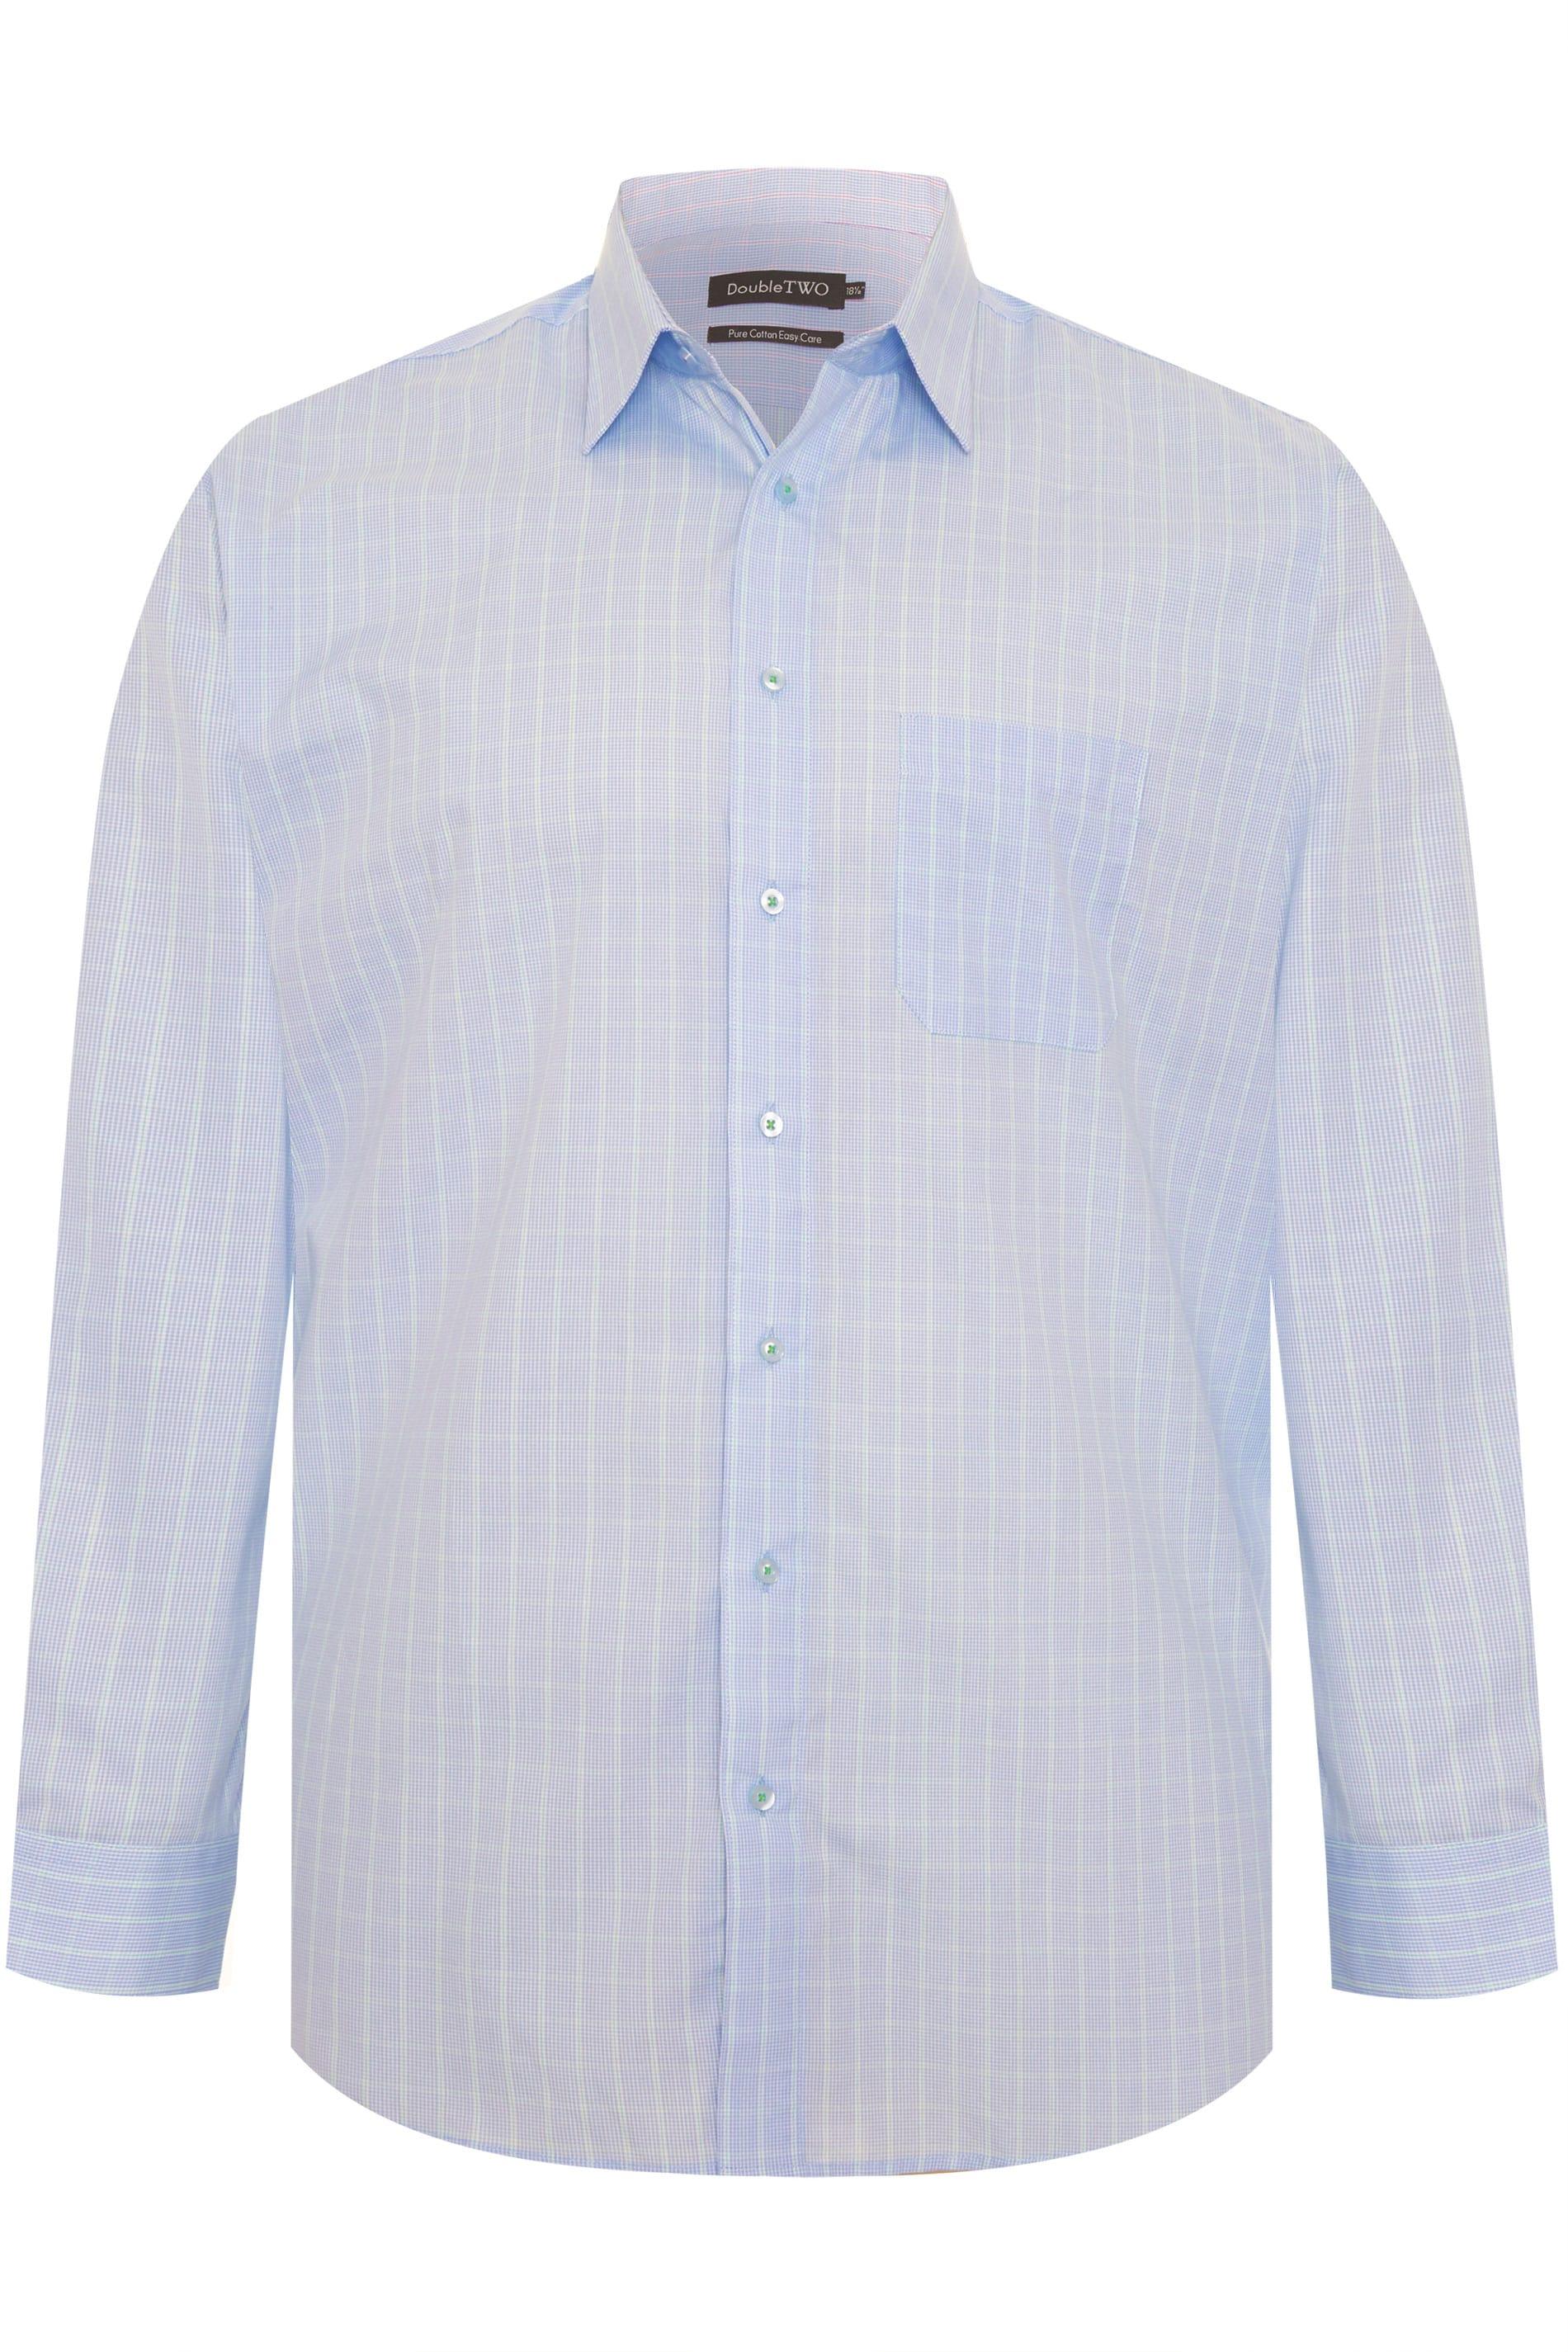 DOUBLE TWO Blue & Green Check Non-Iron Long Sleeve Shirt